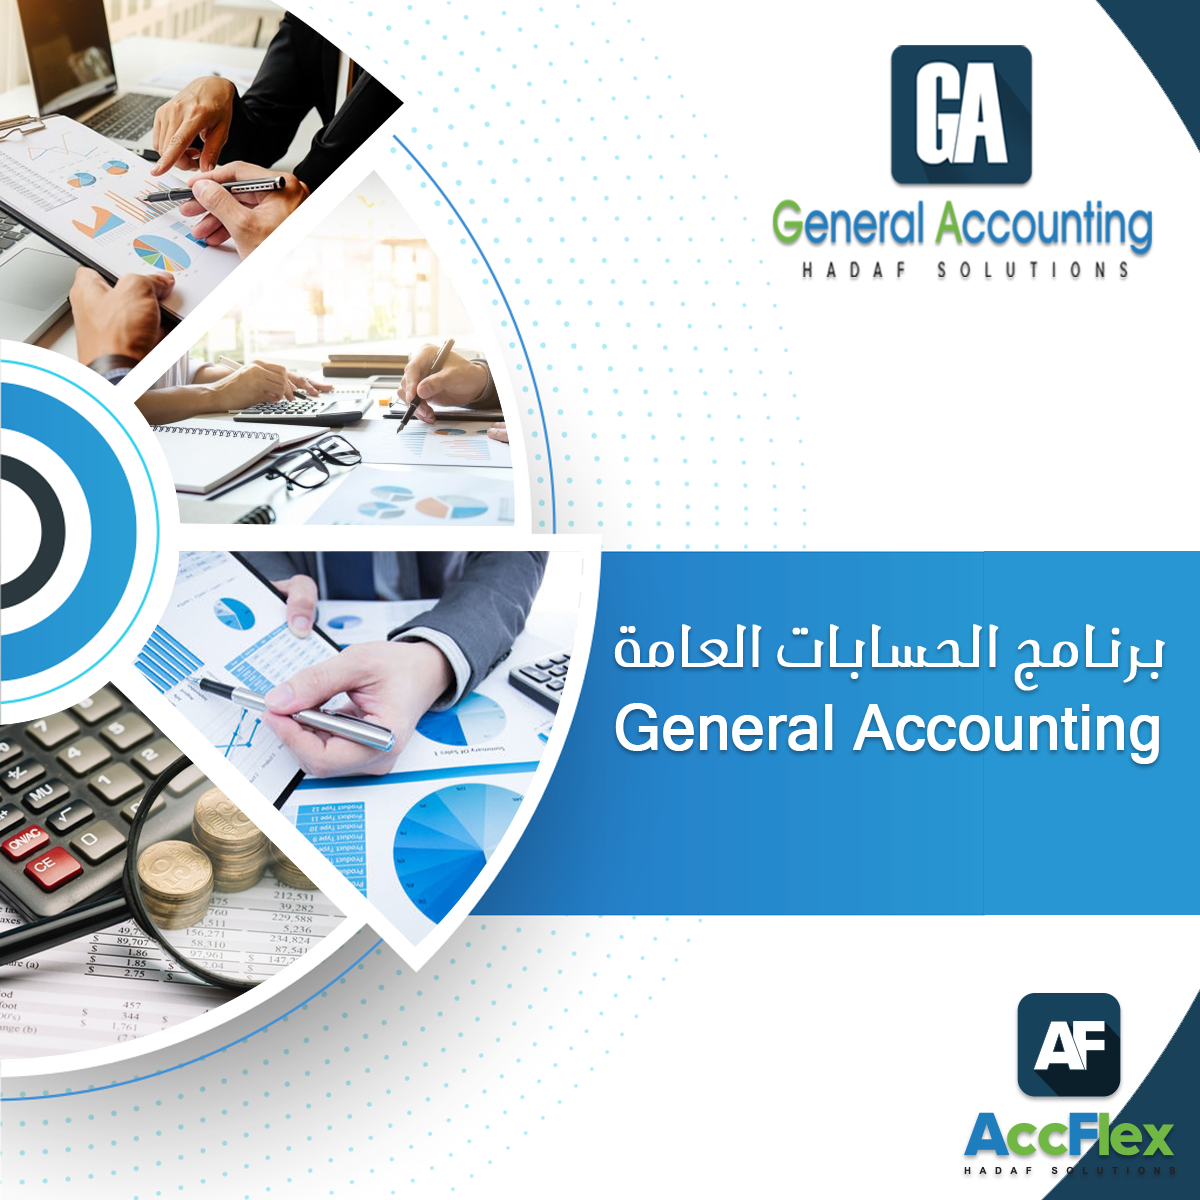 برنامج الحسابات العامة Accounting Accounting Software General Ledger